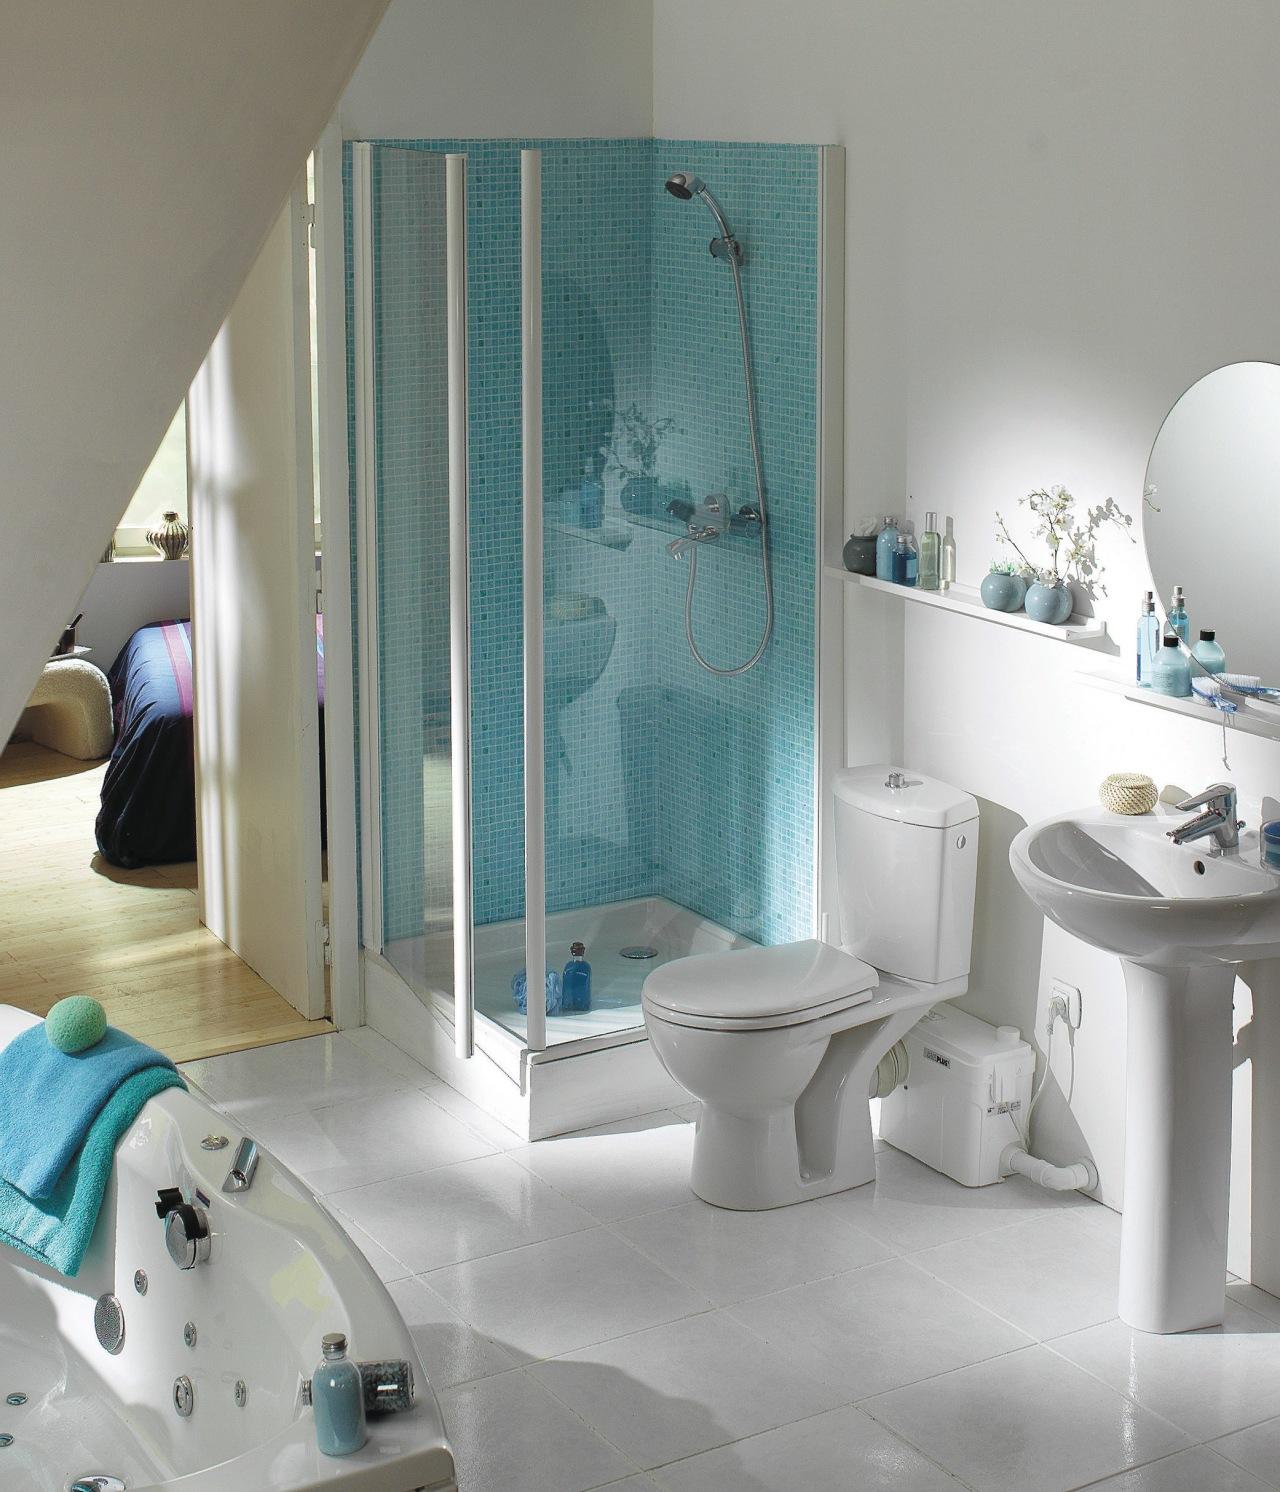 View of a bathroom which features Saniflo pumps. bathroom, bathtub, floor, interior design, plumbing fixture, room, tile, window, gray